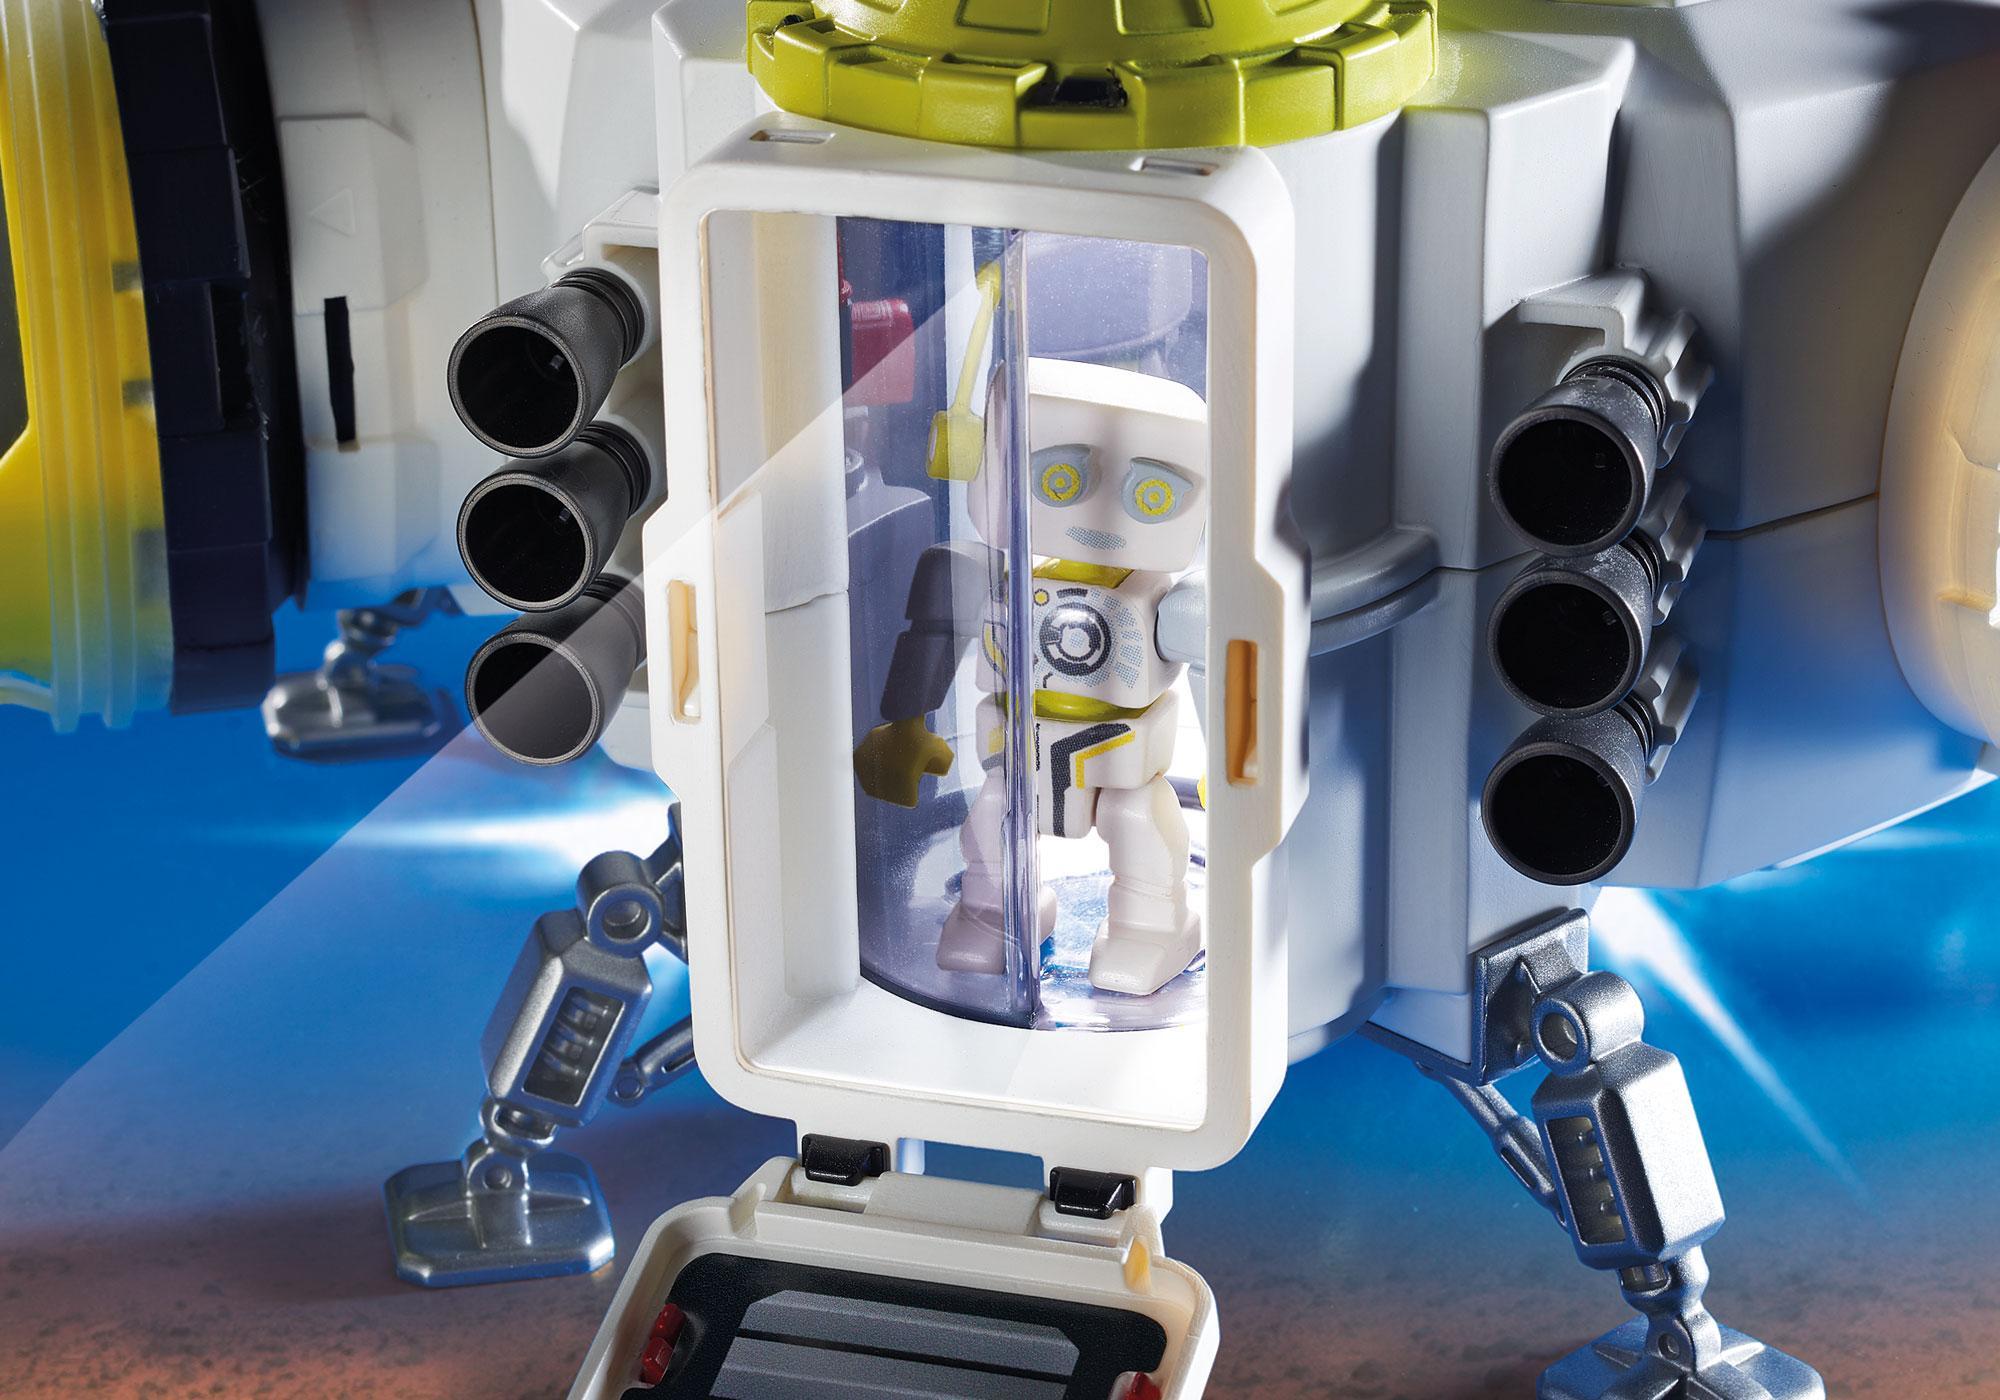 http://media.playmobil.com/i/playmobil/9487_product_extra3/Διαστημικός Σταθμός στον Άρη